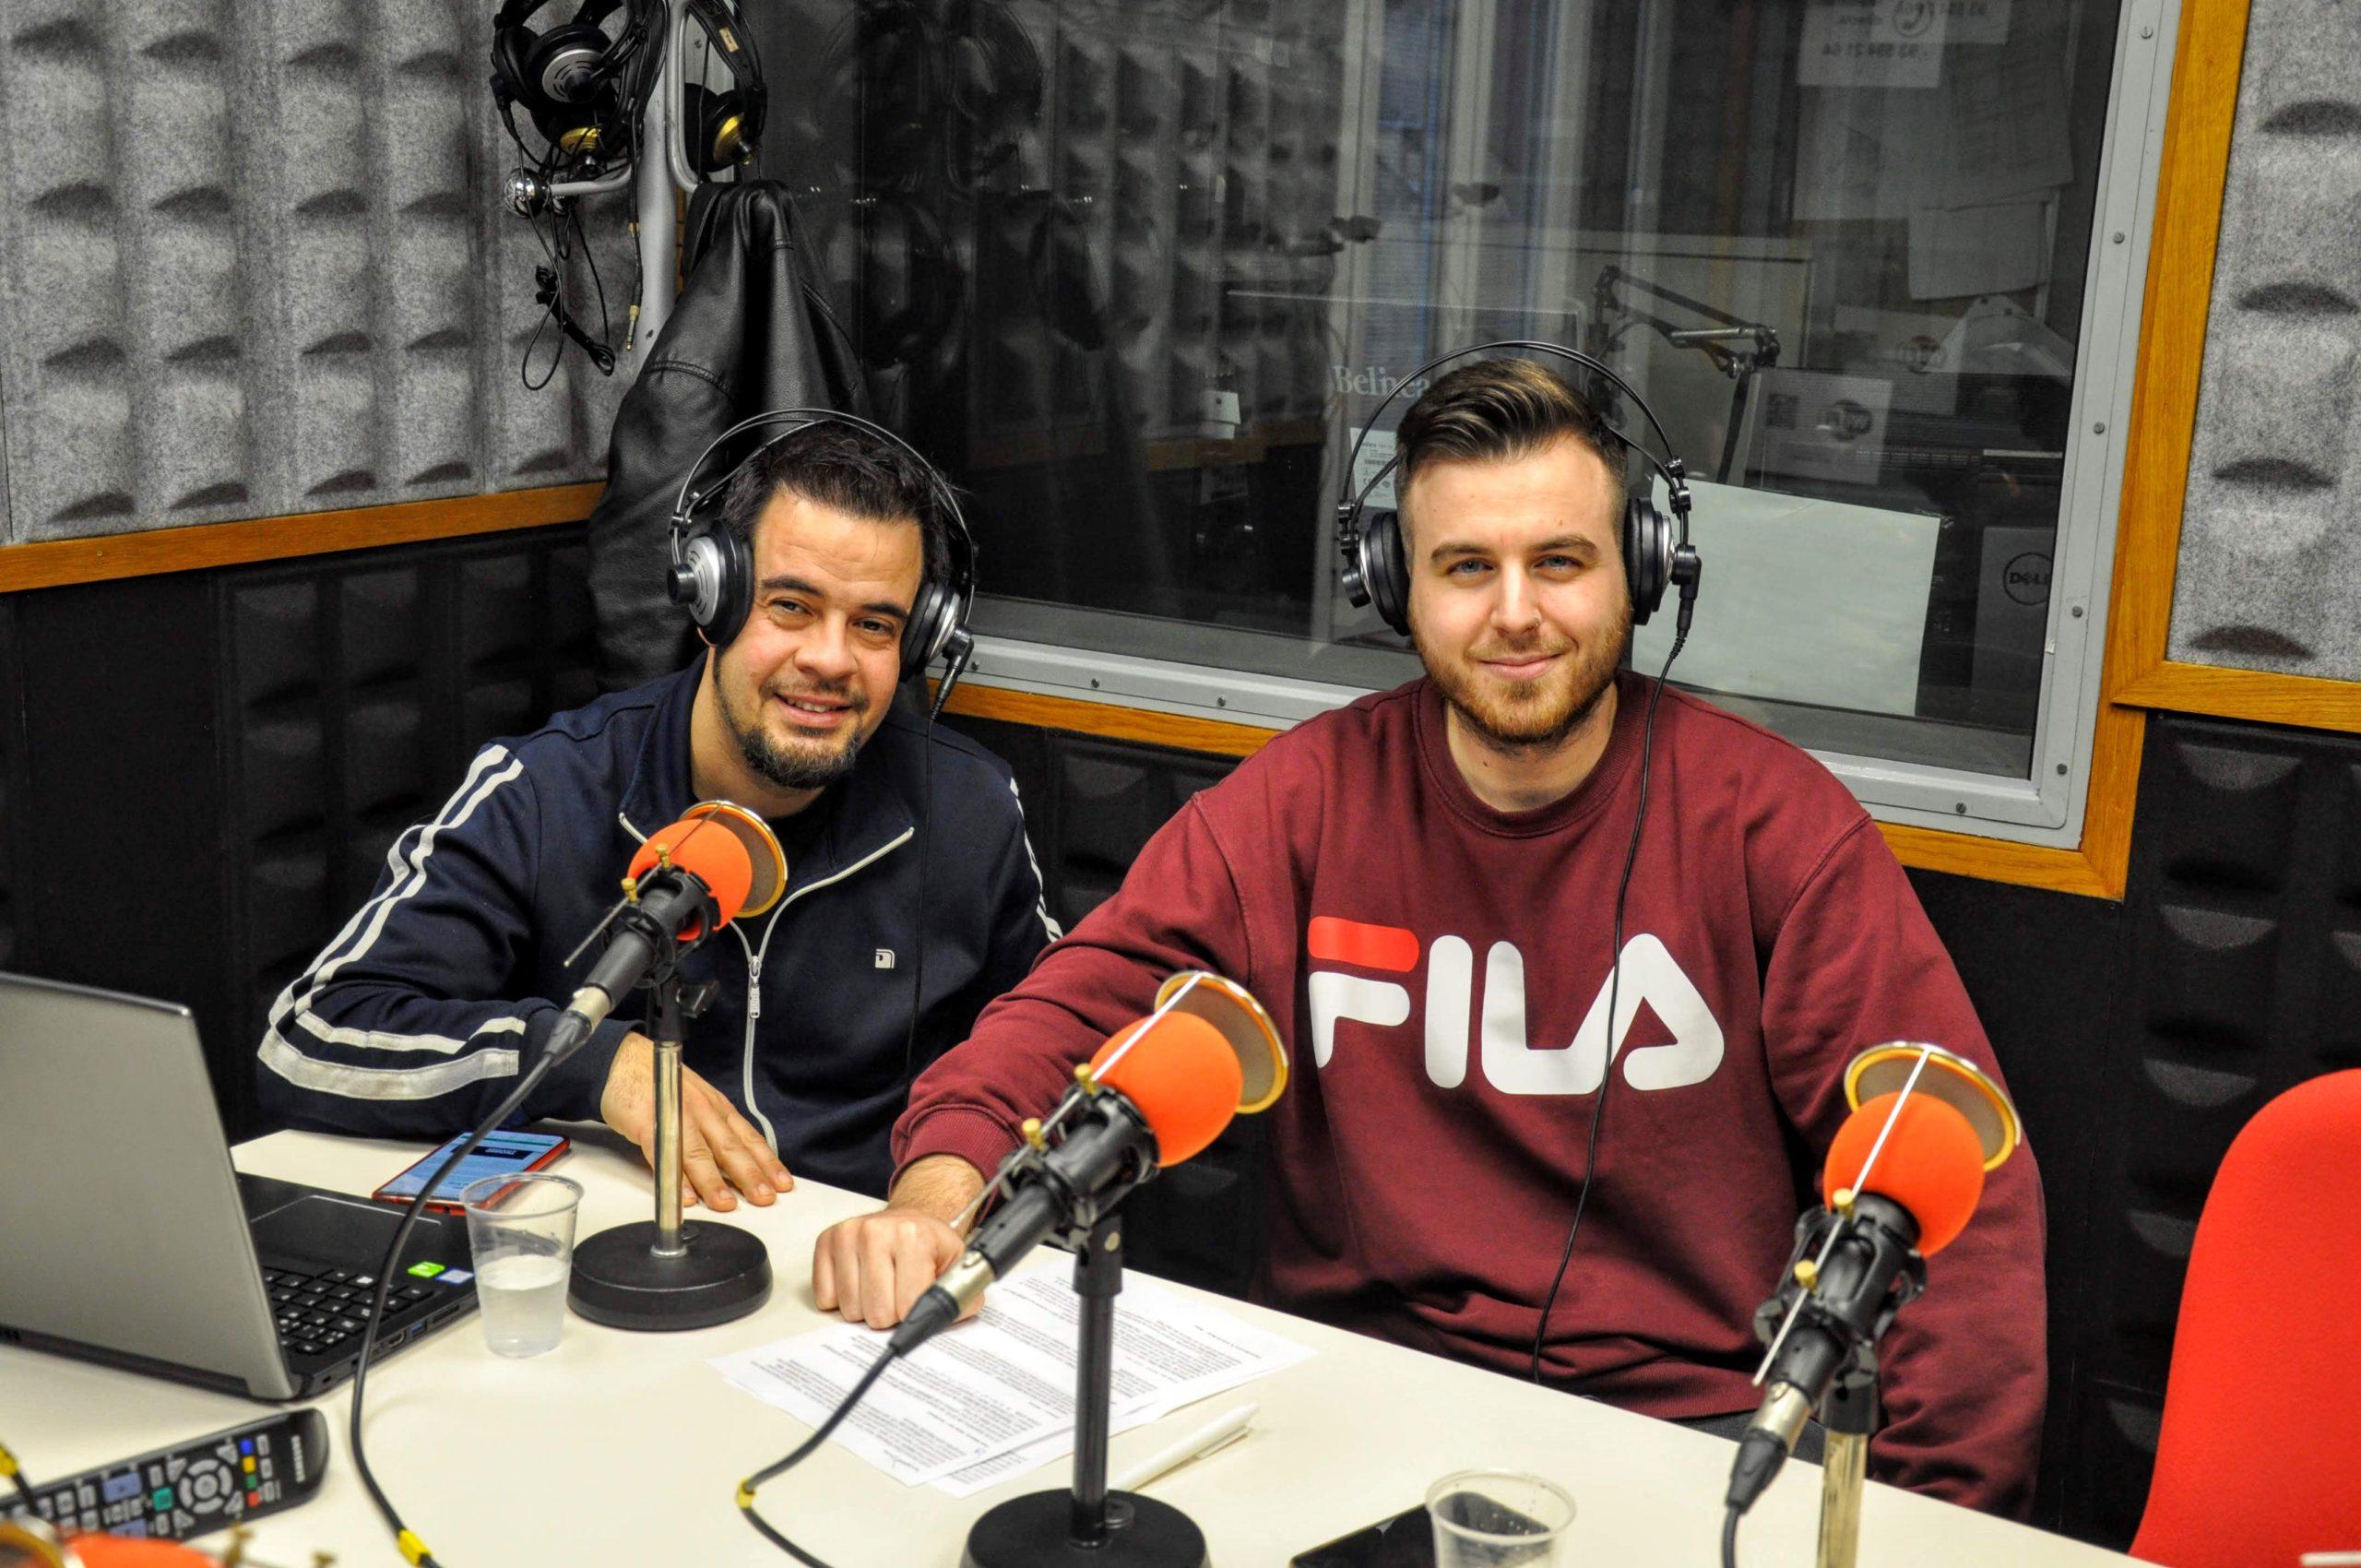 David Giorcelli, Jose Ibañez